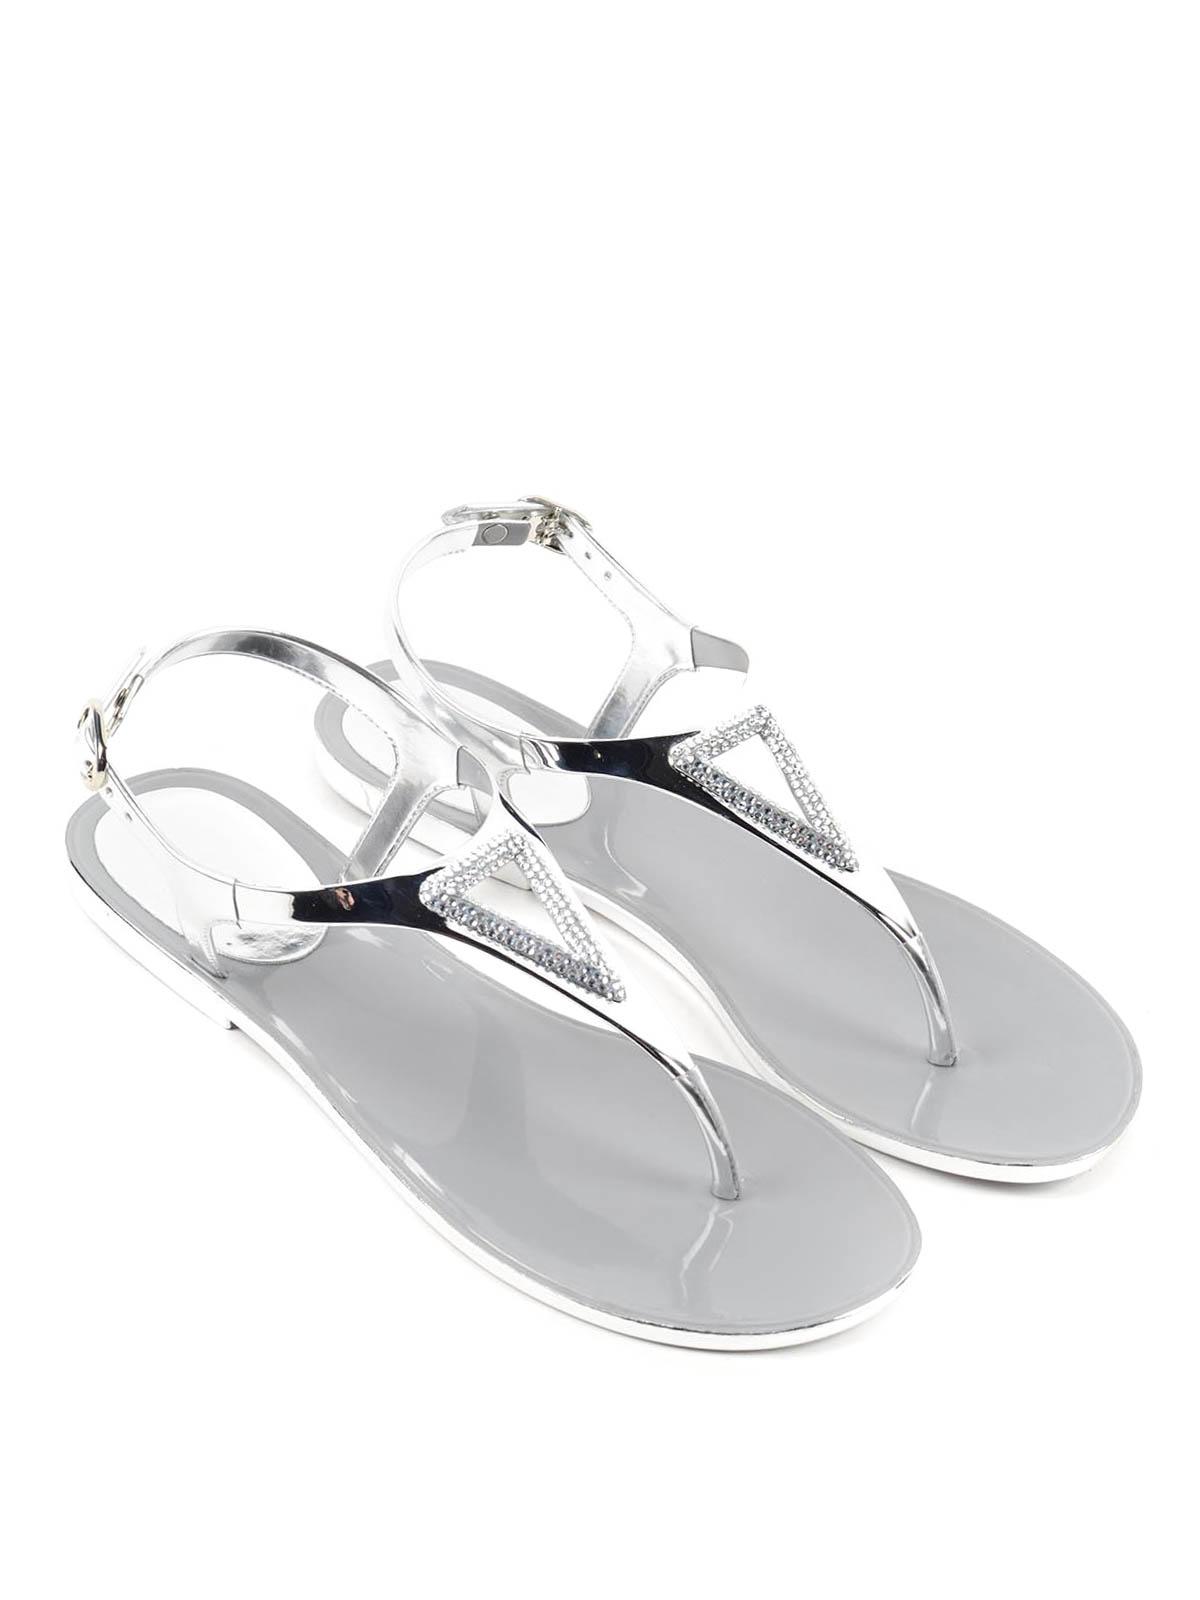 83a38d6fafa20 Stuart Weitzman - Thong sandals with rhinestones - sandals ...